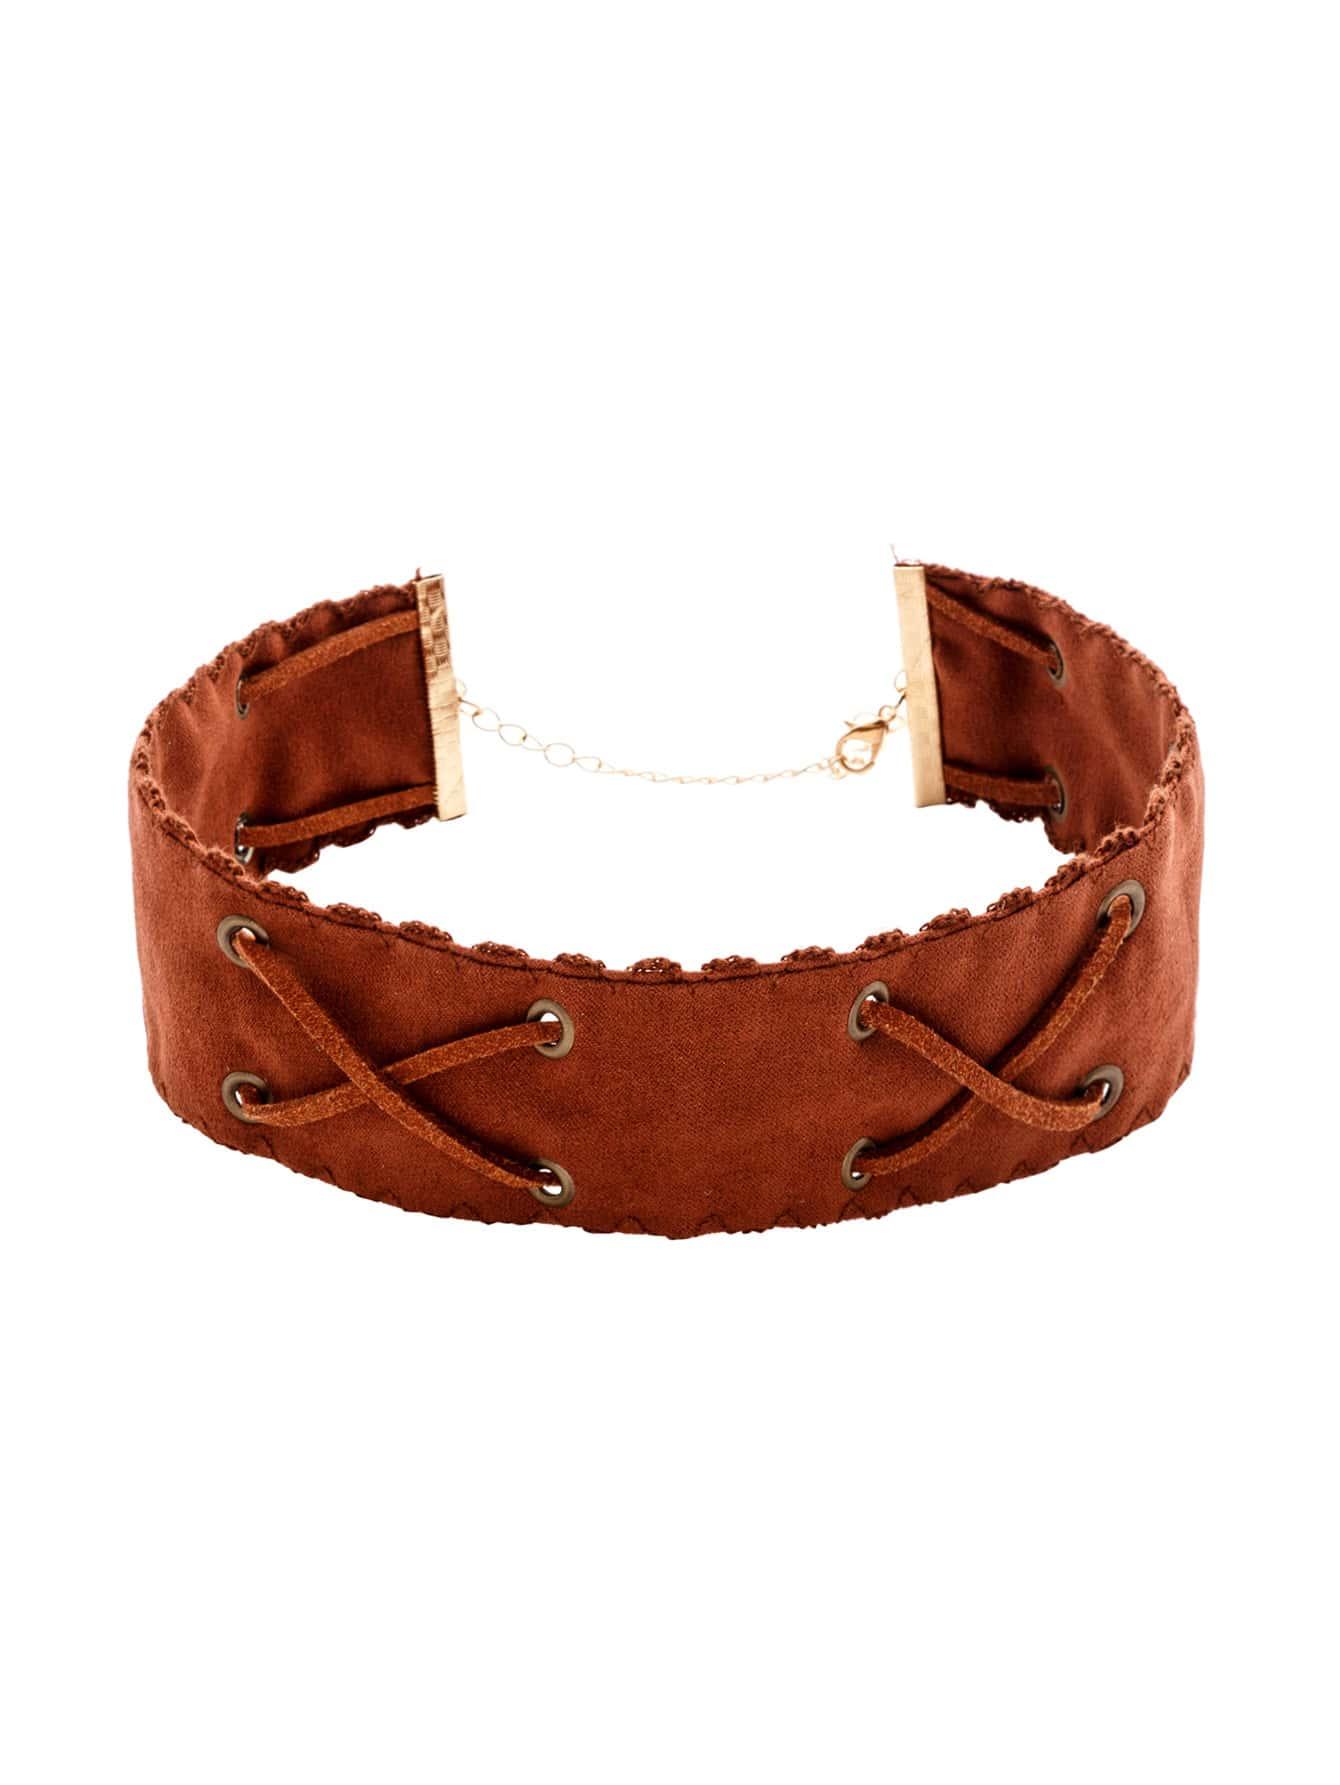 necklacenc161024311_2